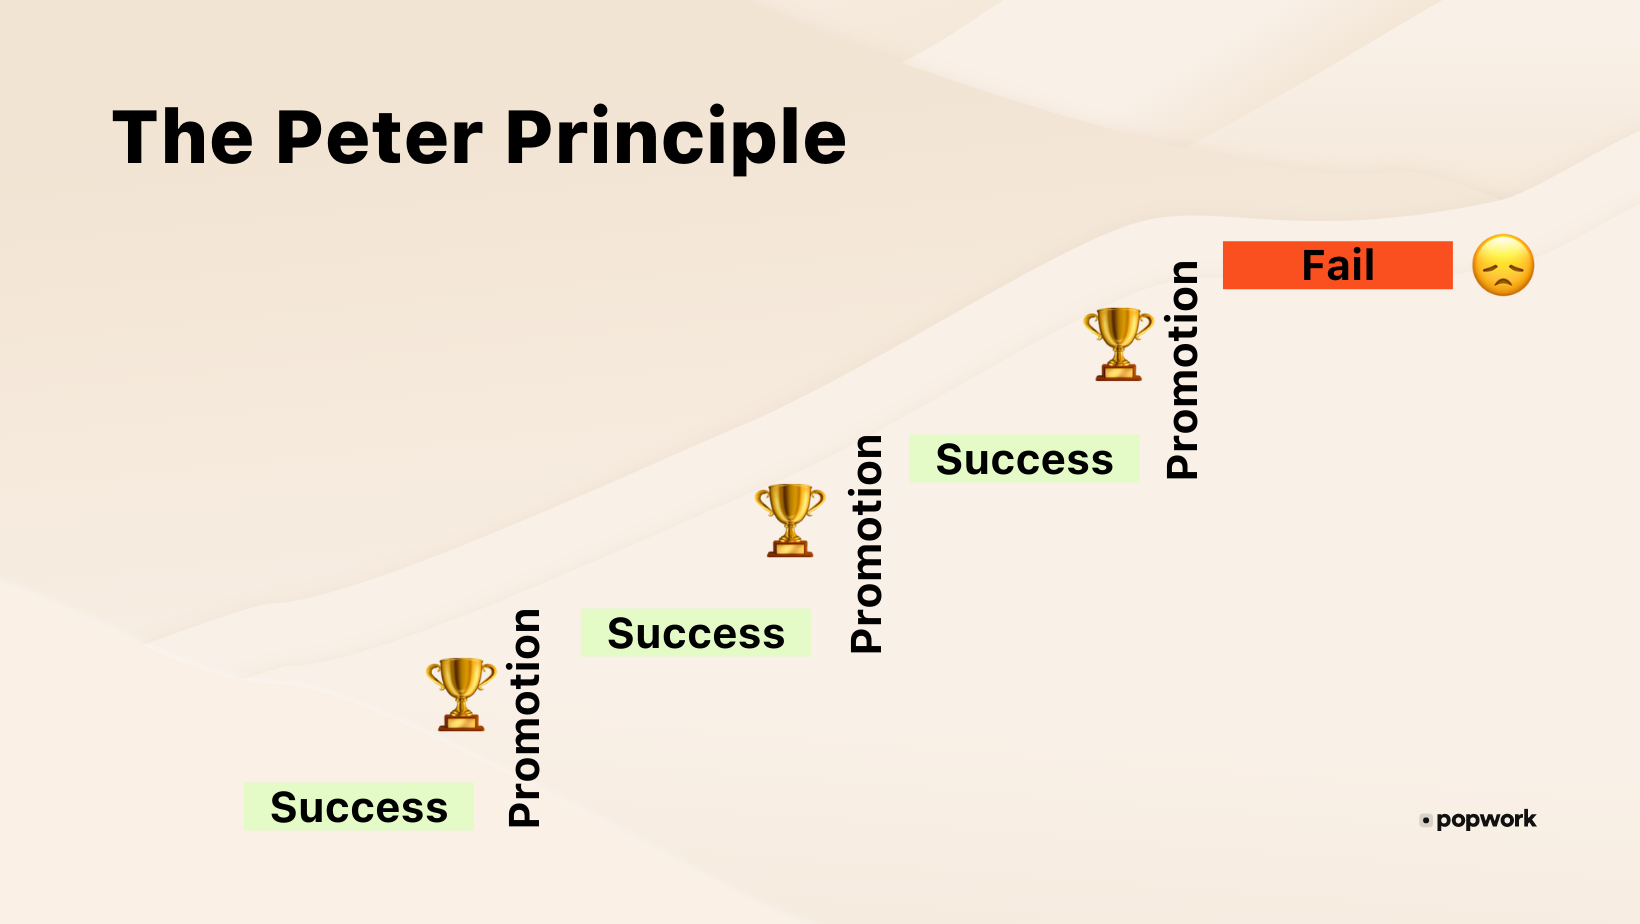 The Peter principle cycle - Popwork